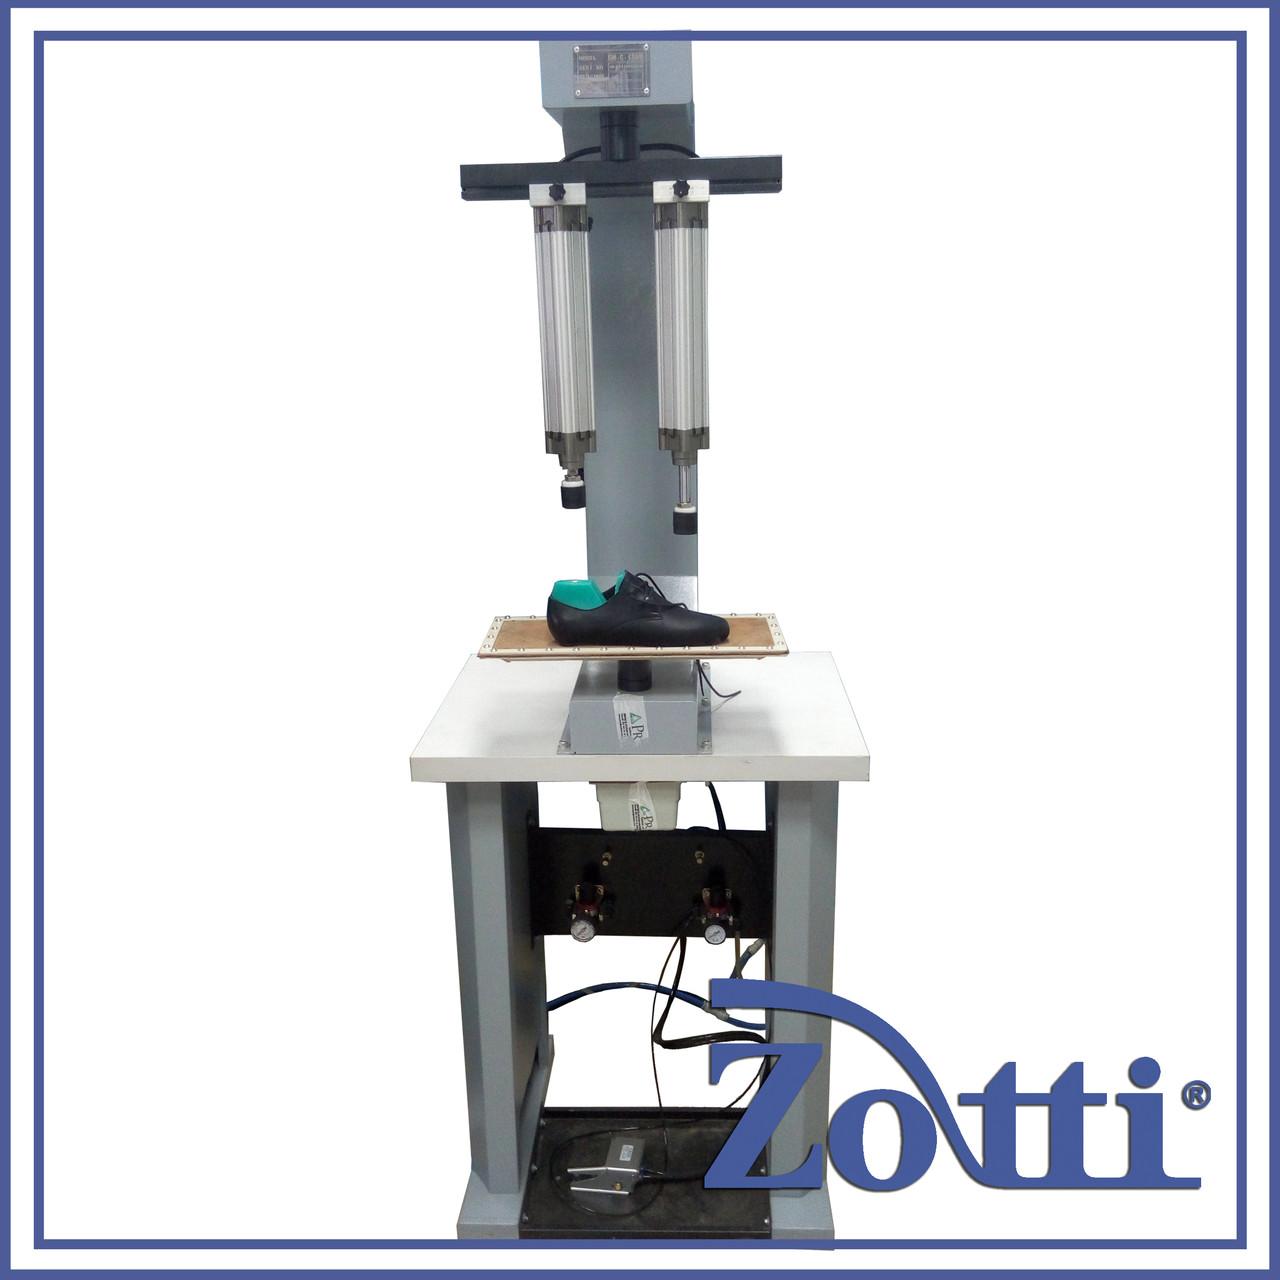 Машина пневматическая для обрисовки следа mod. Gm-c-1300. Prestij (Турция)